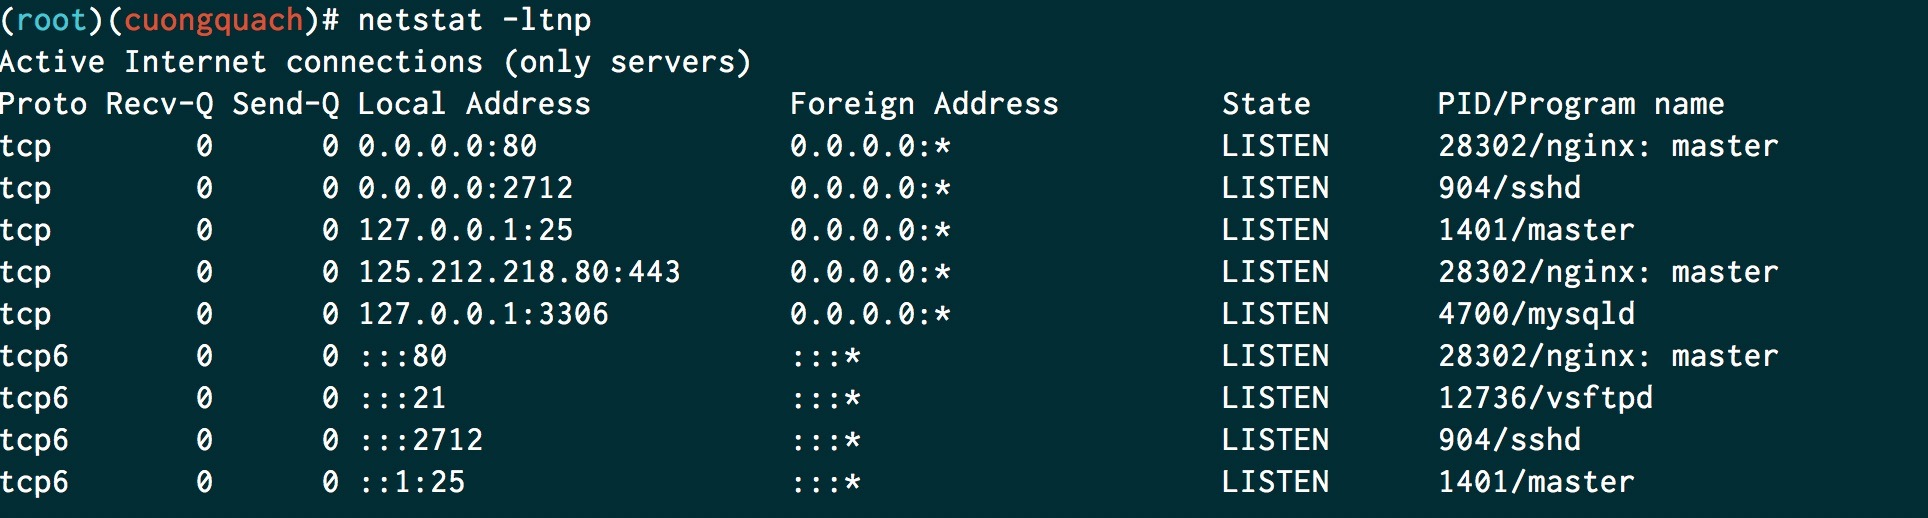 lệnh netstat kiểm tra port tcp mở